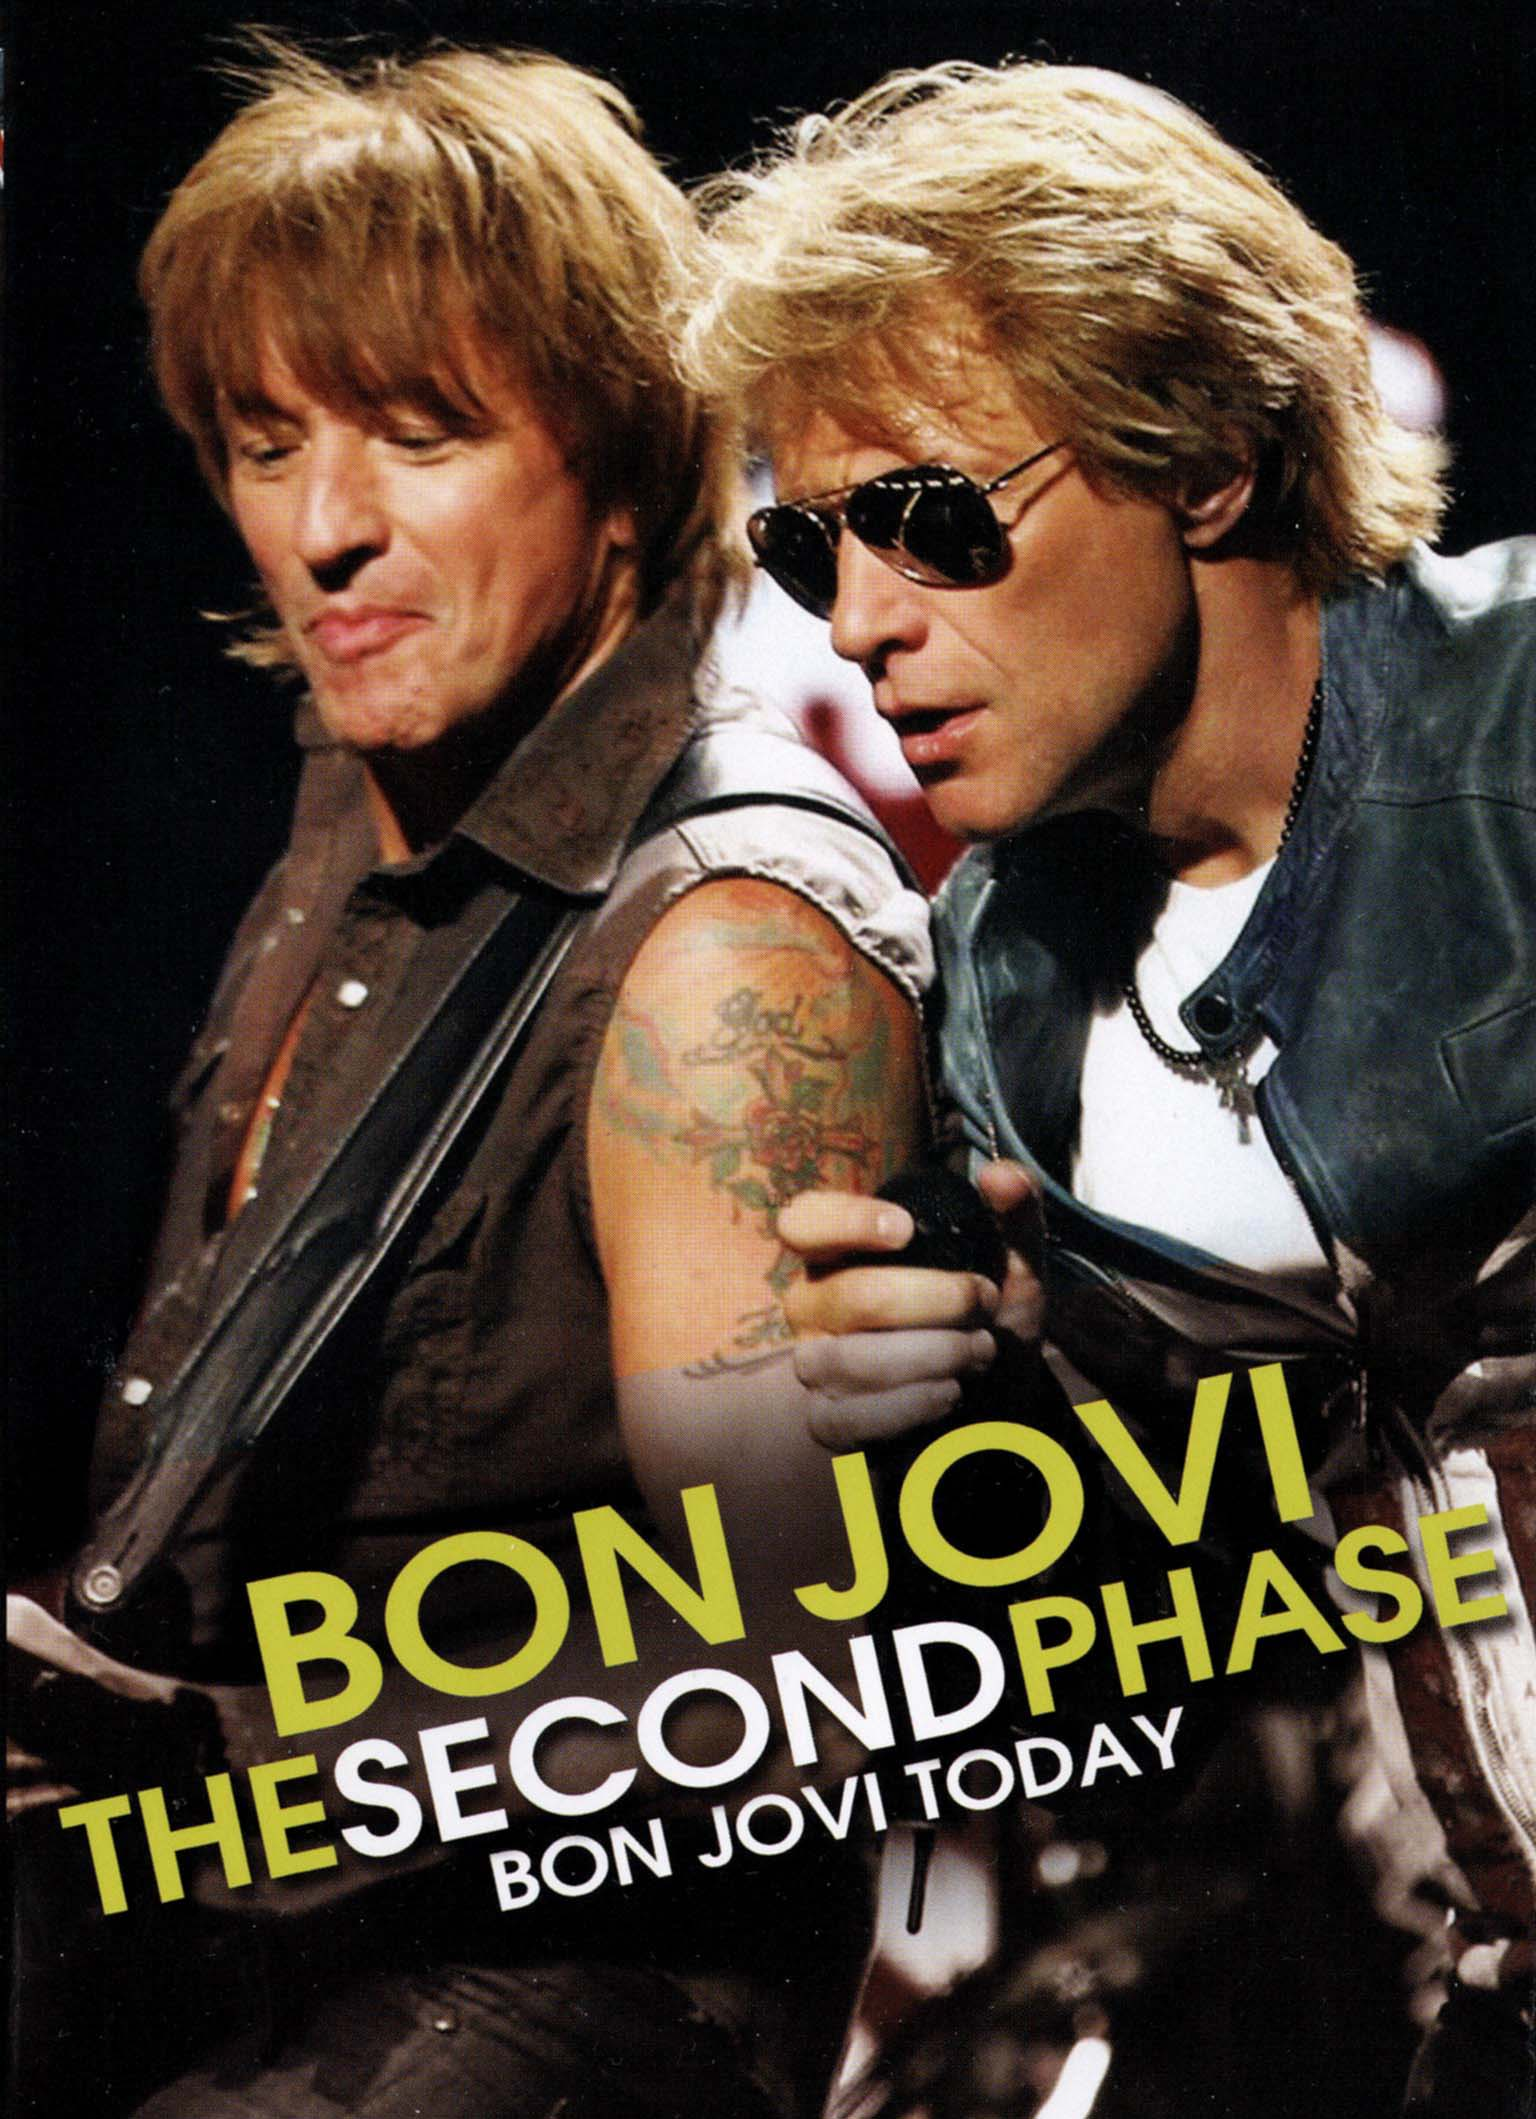 Bon Jovi: The Second Phase